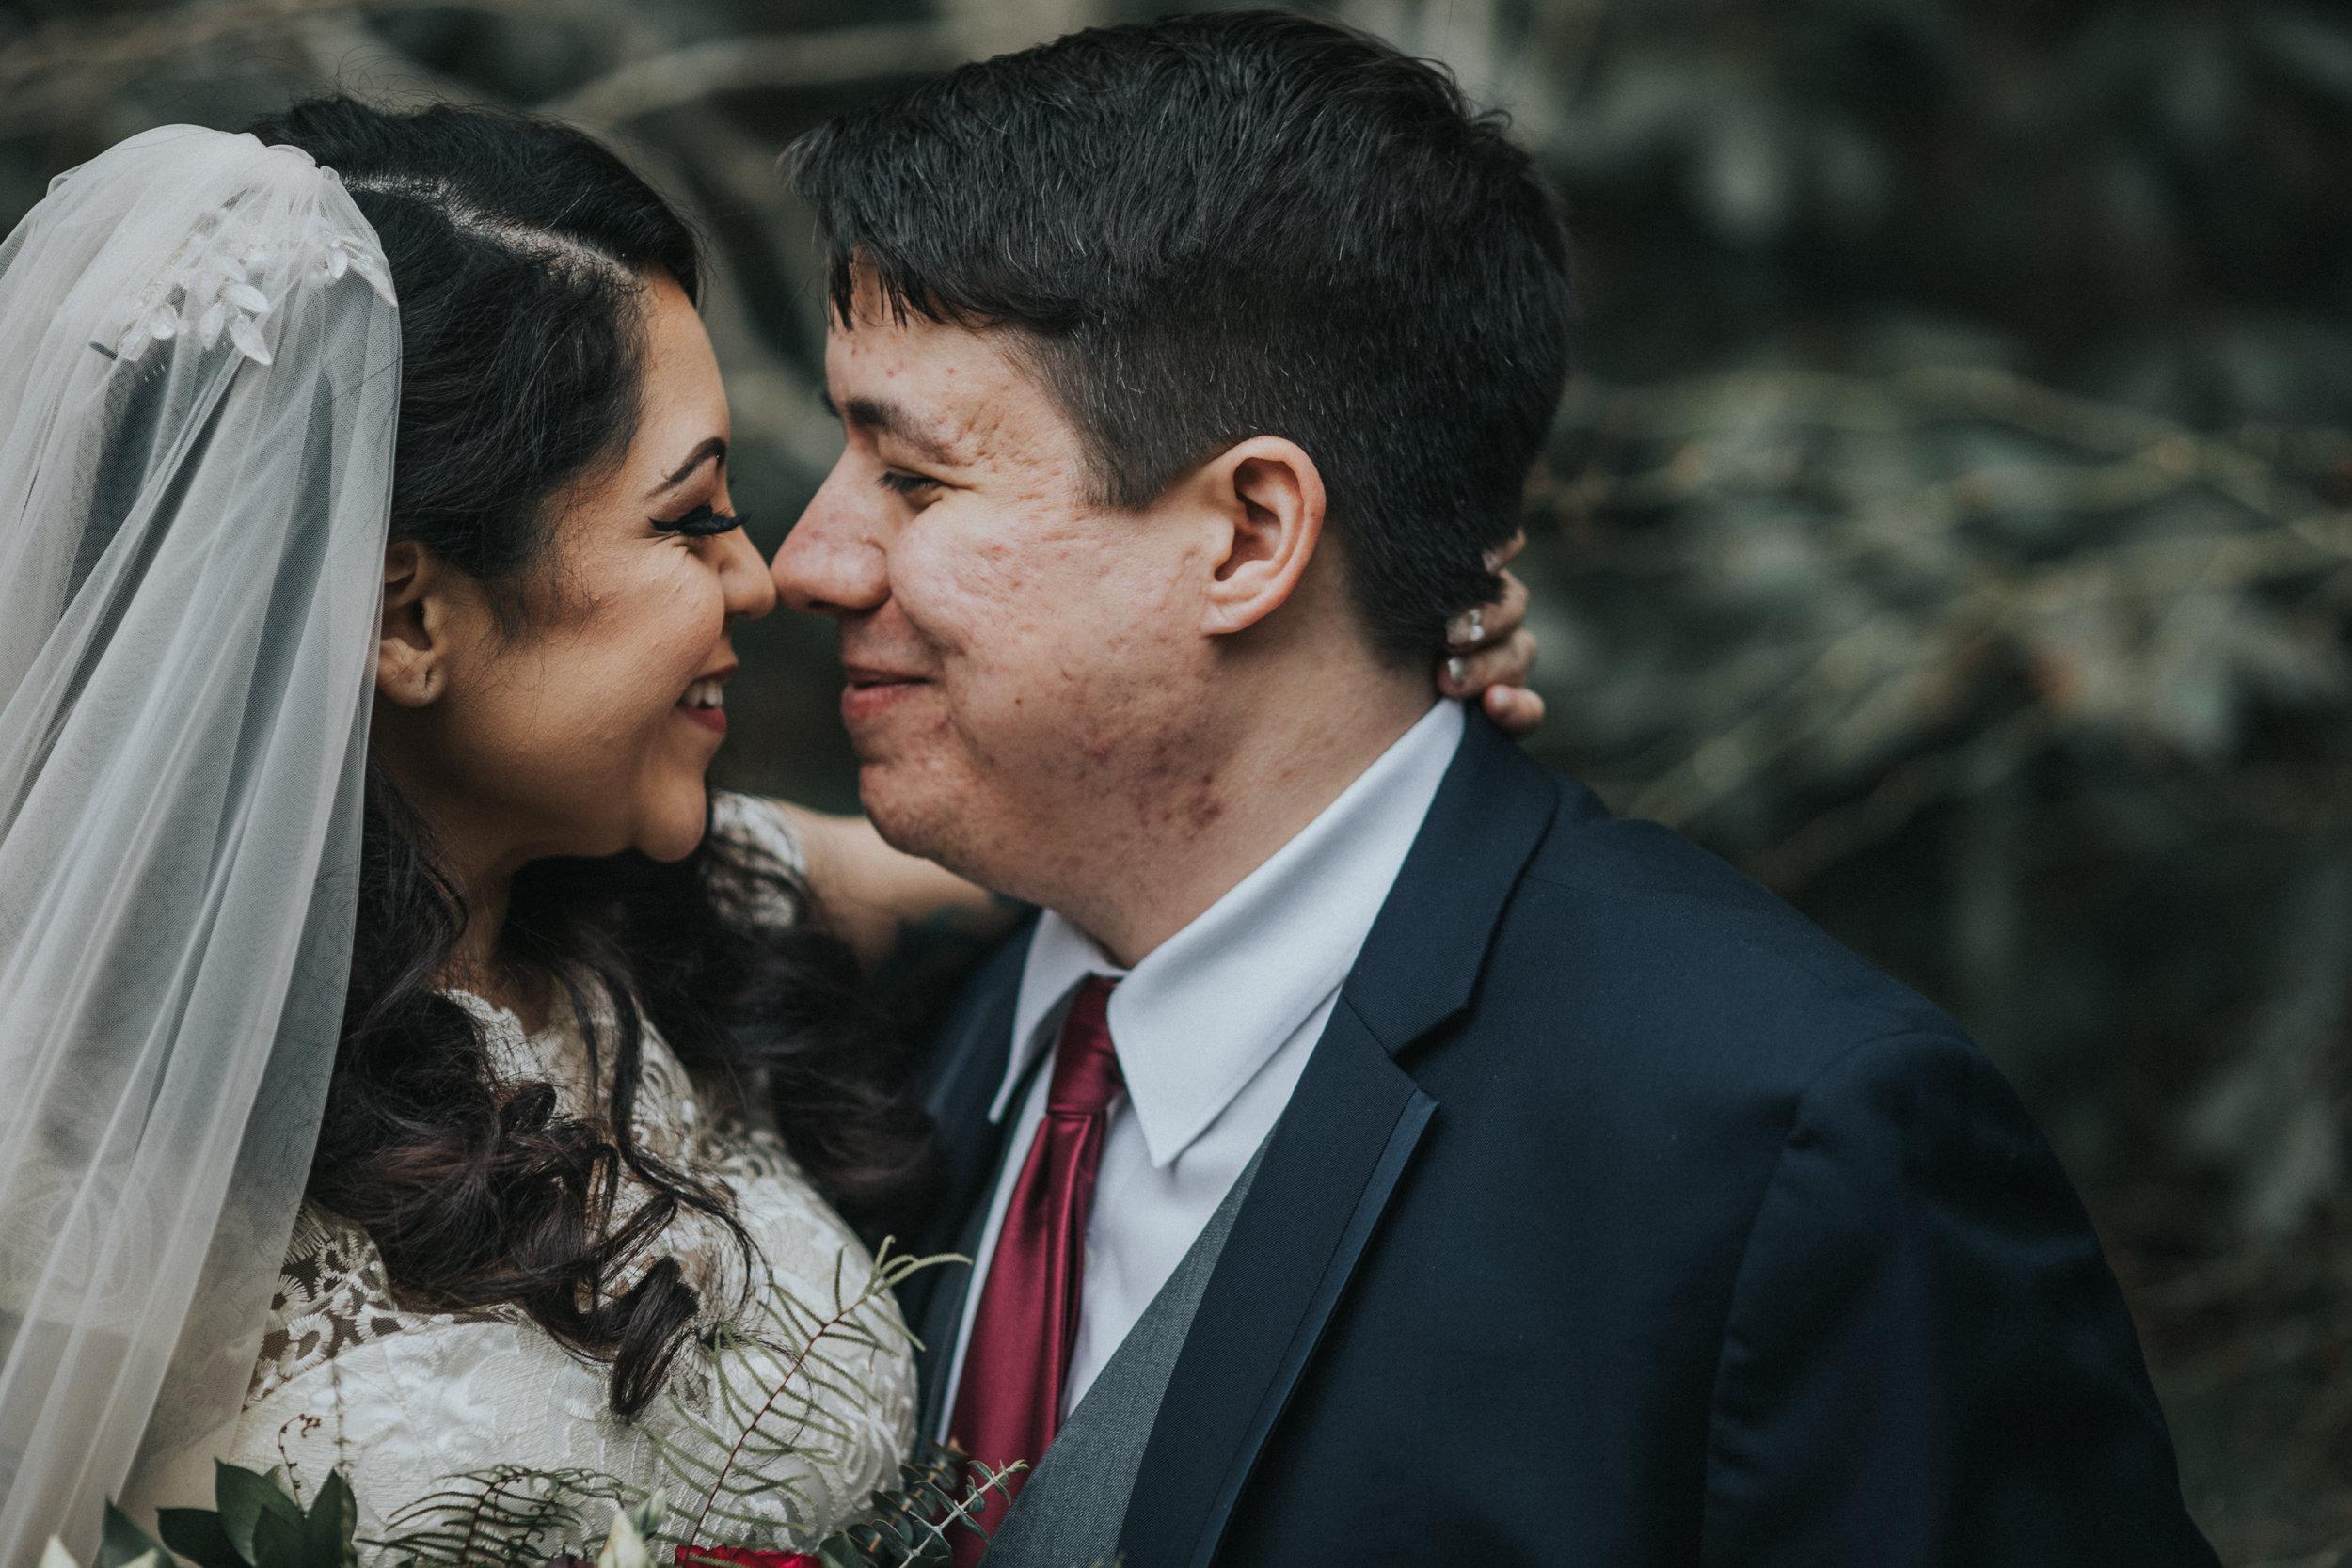 New-Jersey-Wedding-Photographer-ReceptionCenter-Valeria&Mike-First-Look-Bride&Groom (26 of 69).jpg